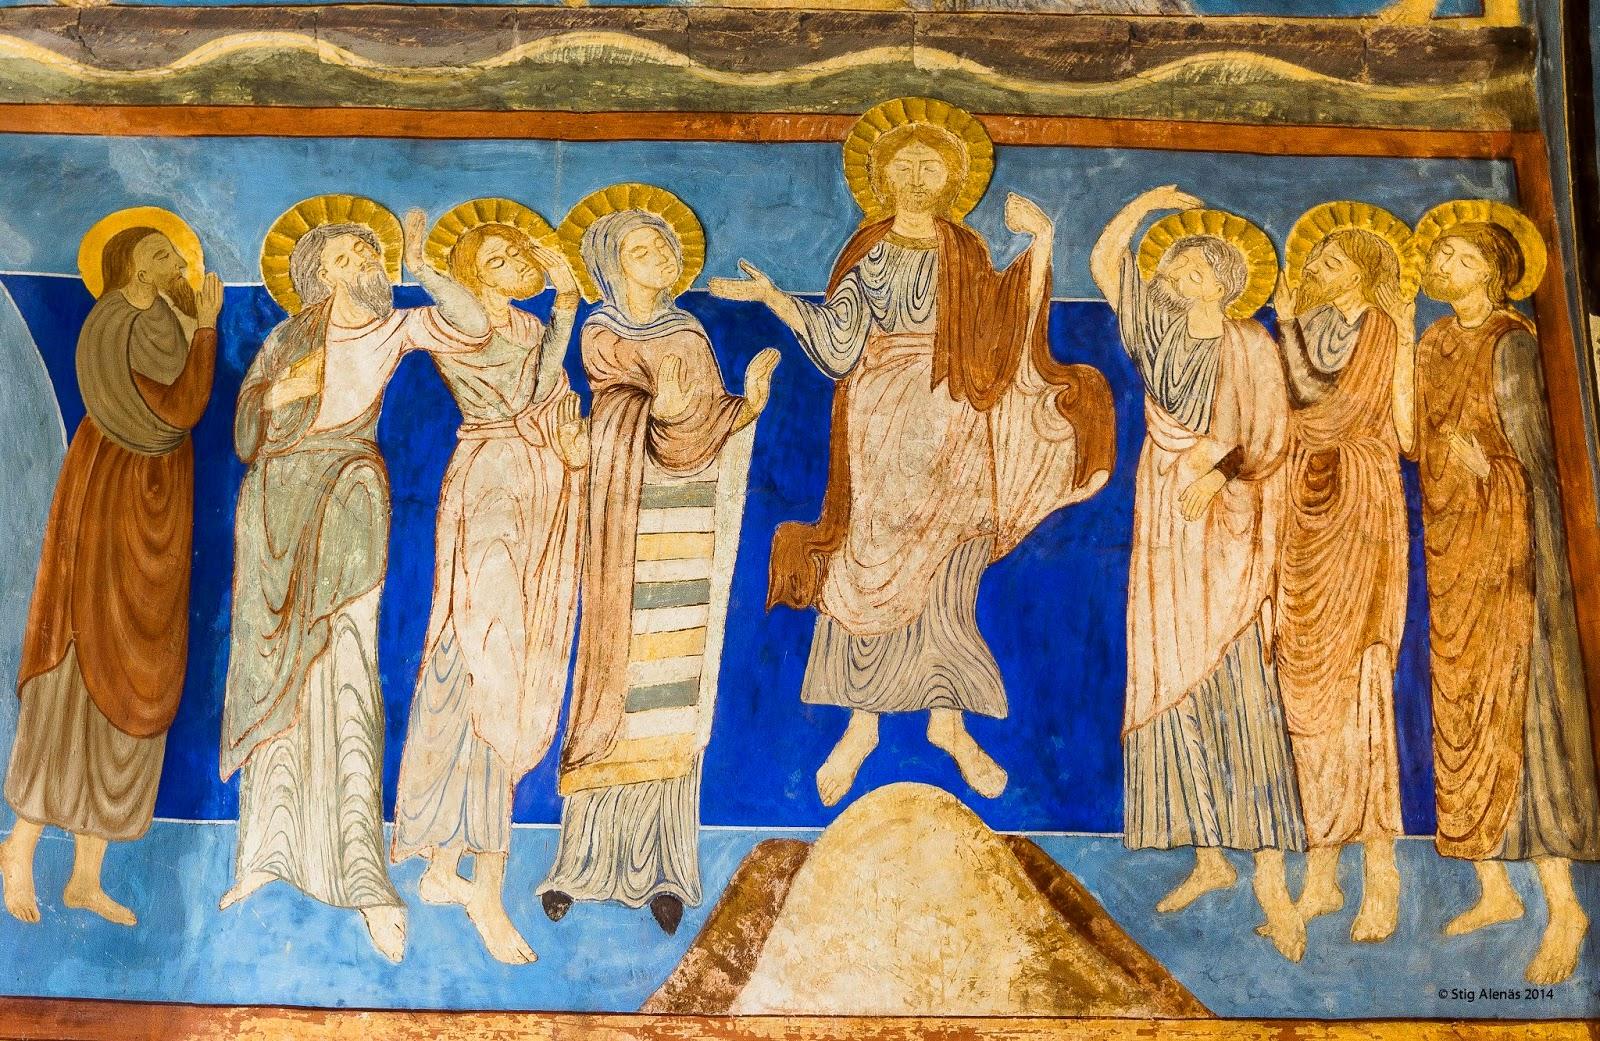 vault, illustrative, halo, disciples, sweden, church, ascension, stucco, interior, christ, ultramarine, religion, byzantine, apostles, romanesque, bjaresjo